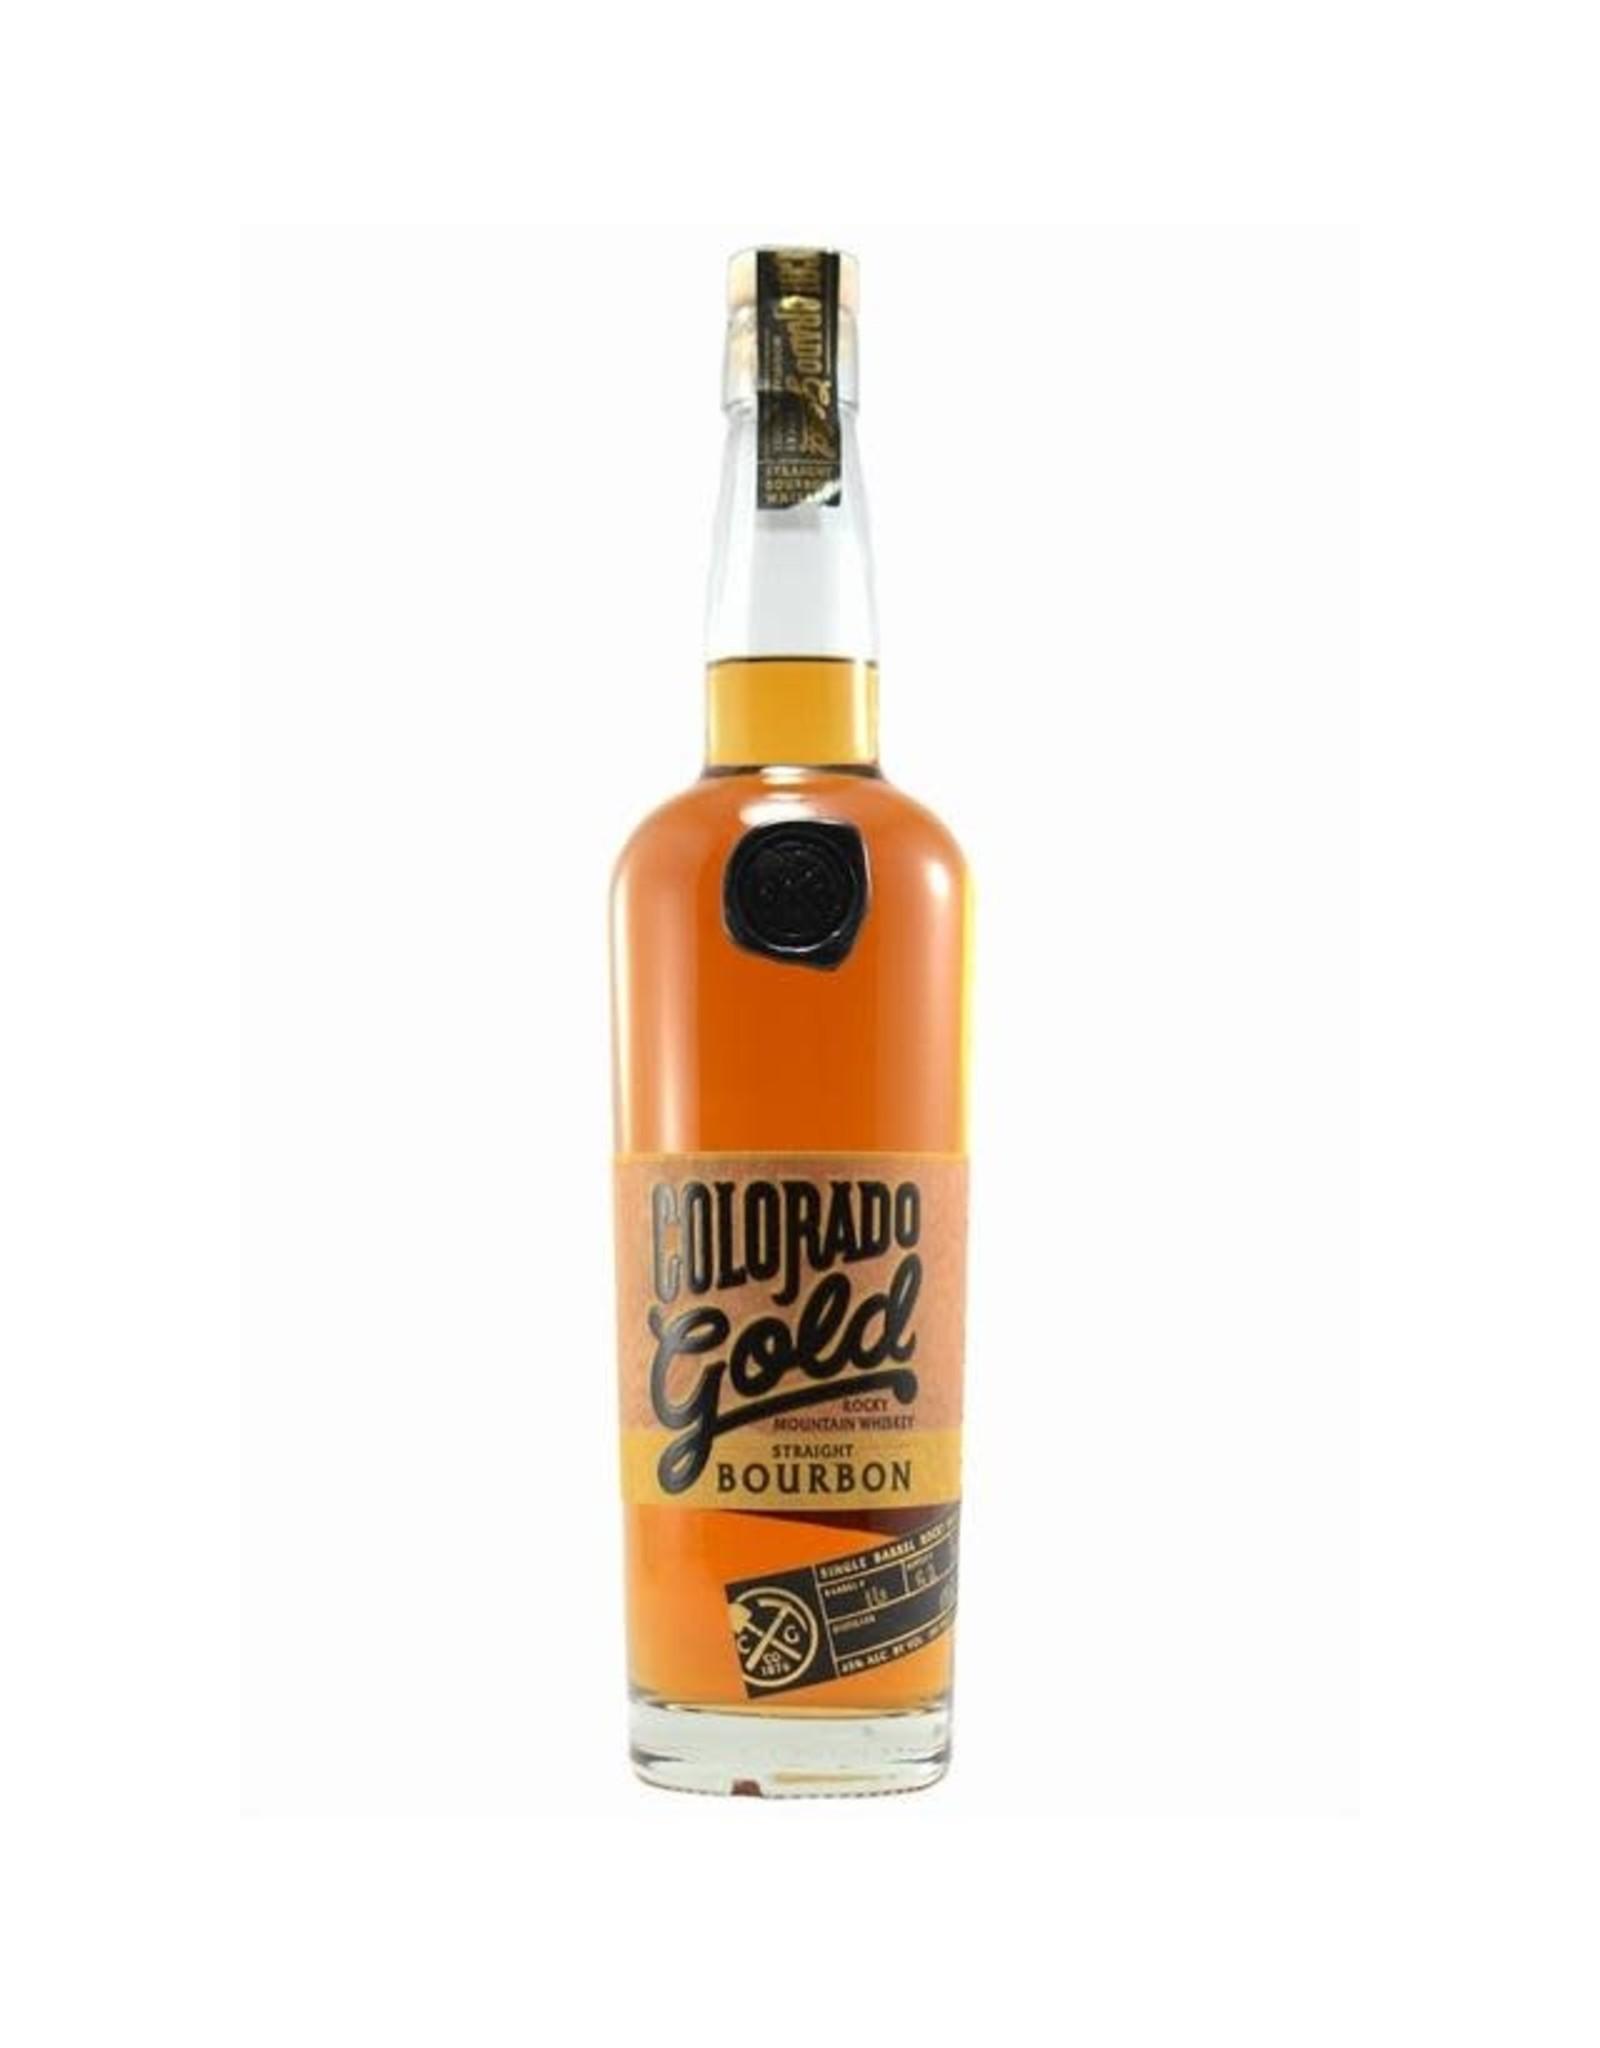 COLORADO GOLD BOURBON 750ML